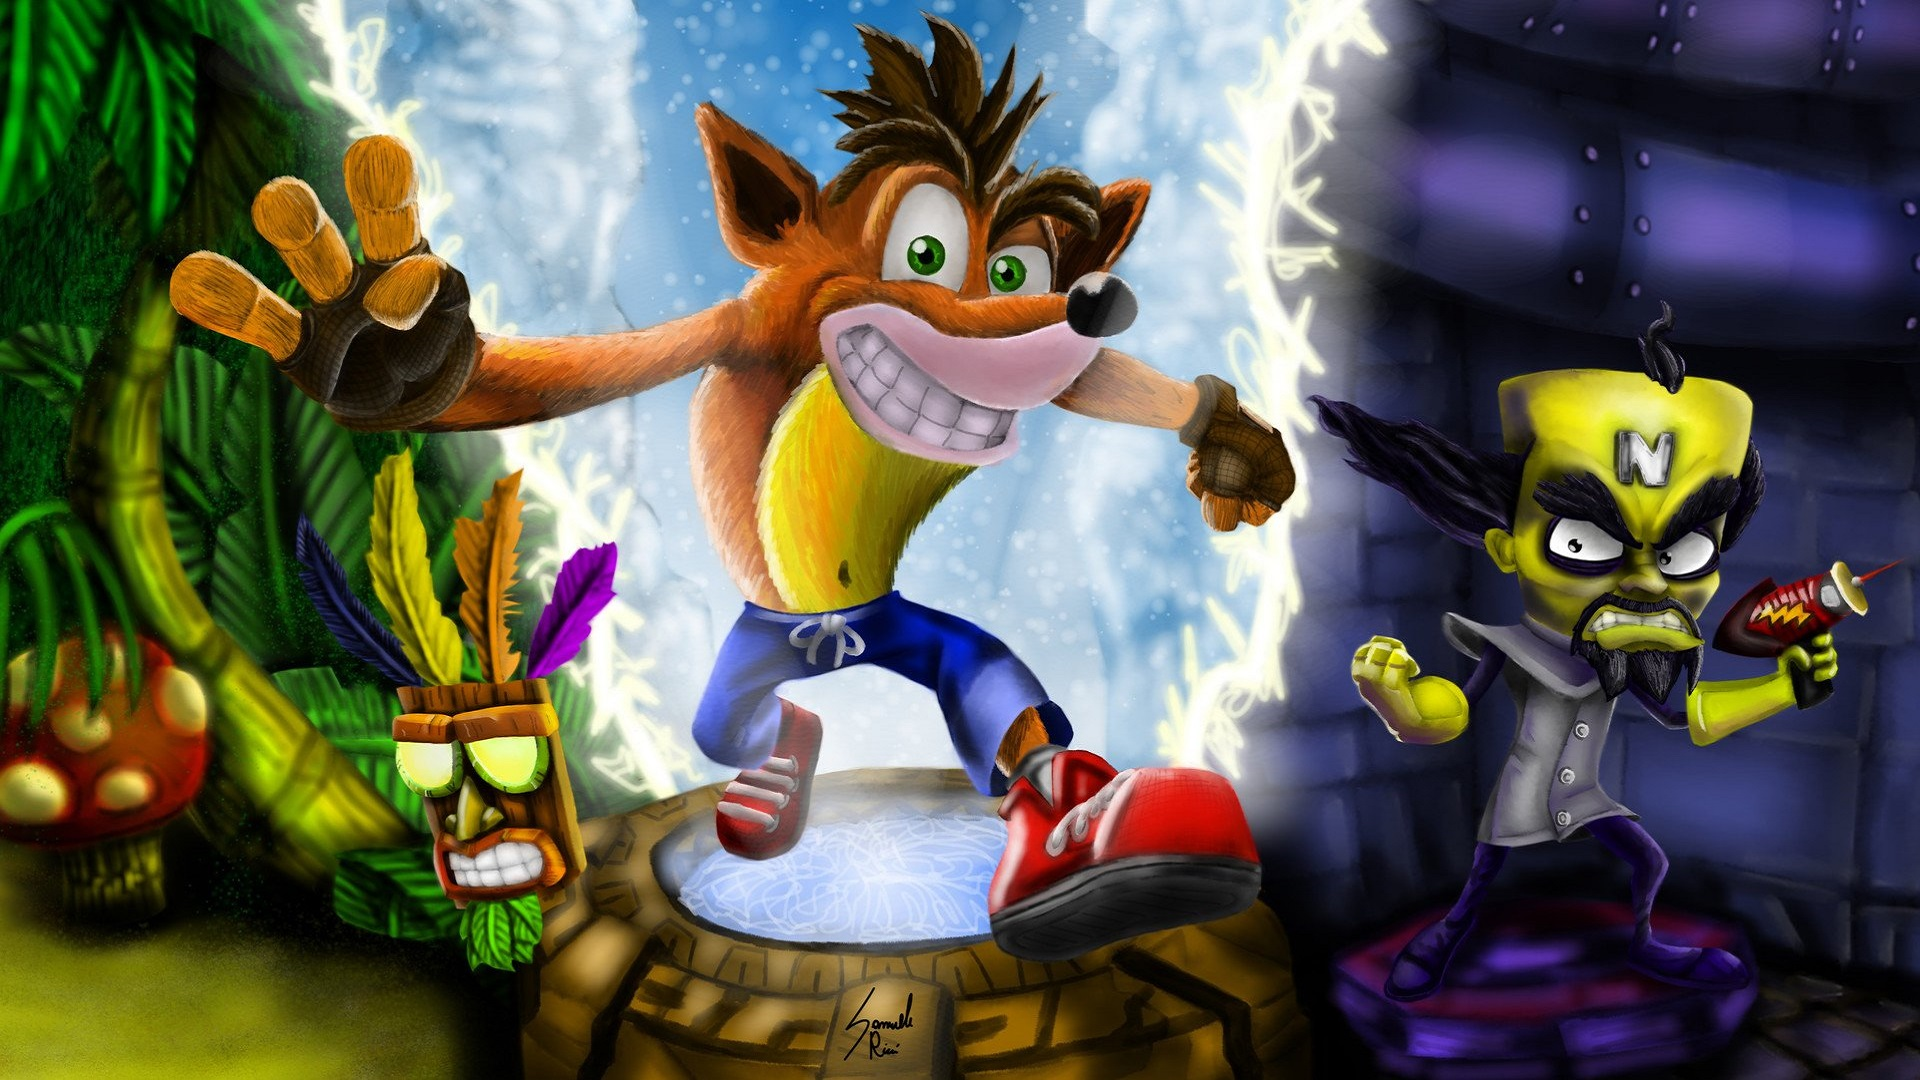 Crash Bandicoot Hd Wallpaper Crash Bandicoot N Sane Trilogy